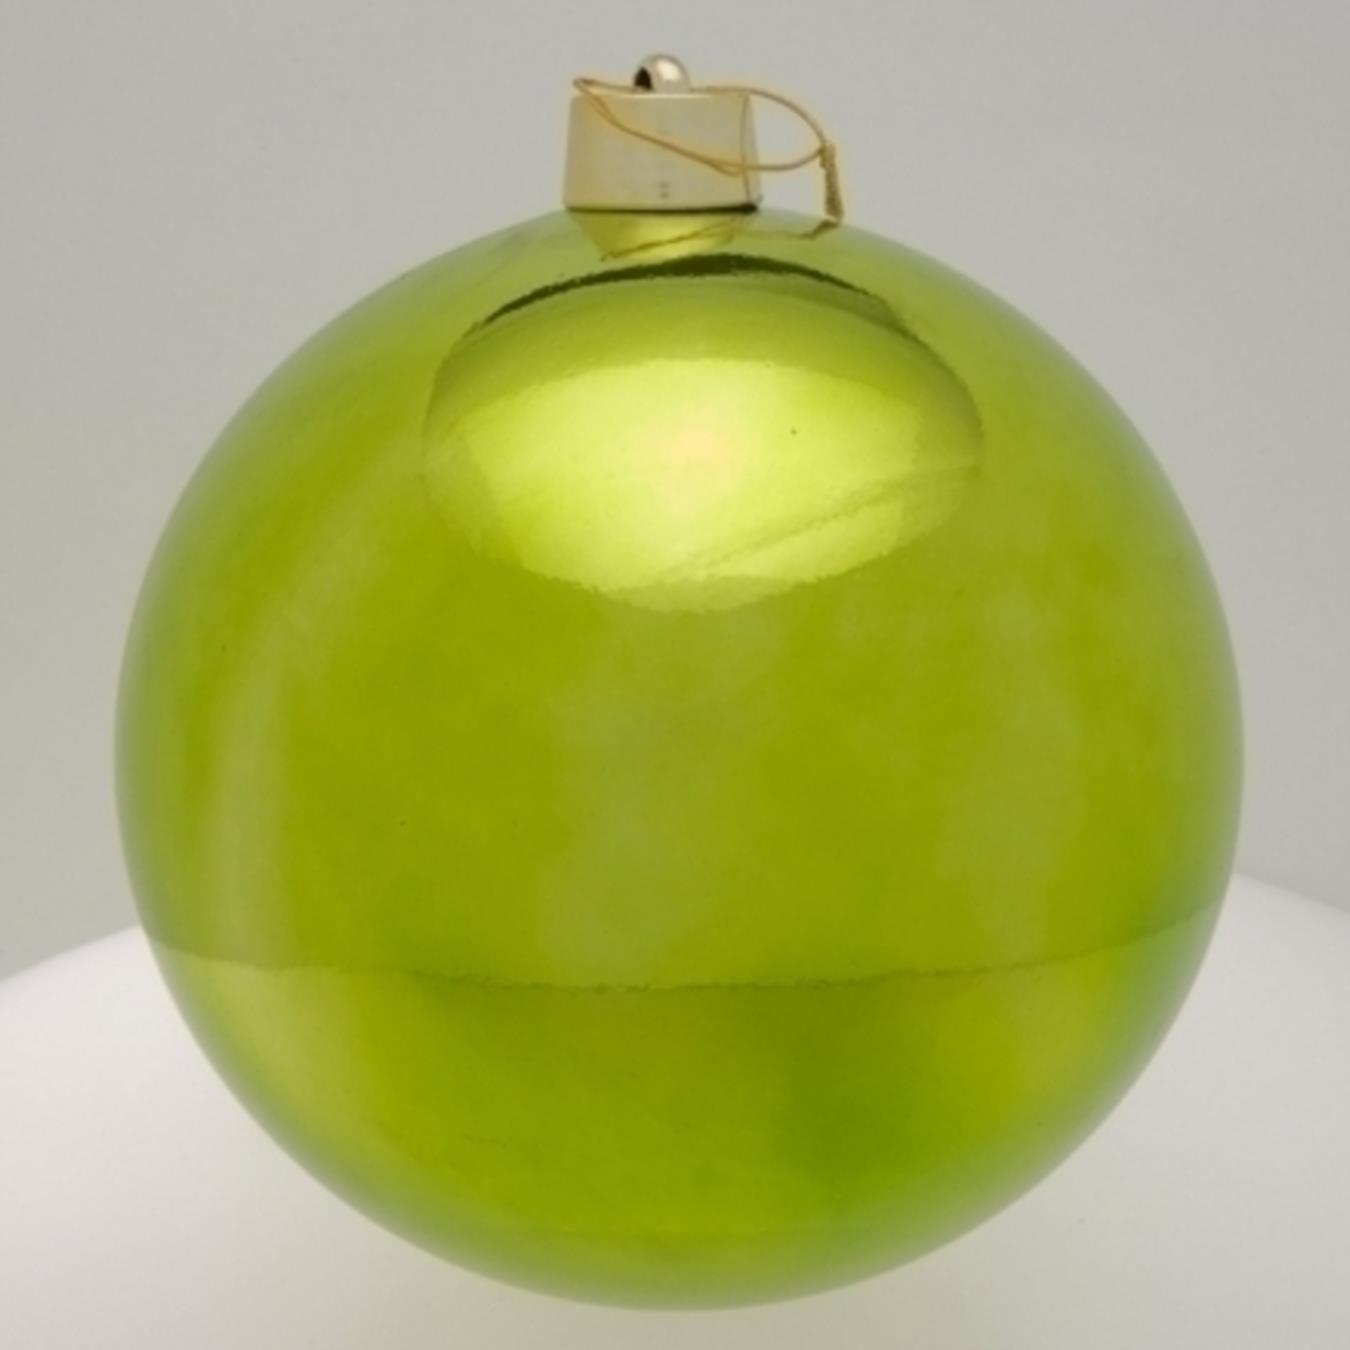 Weihnachtskugeln Xxl.Weihnachtskugel Lindgrün Glänzend 30cm 1 Stück